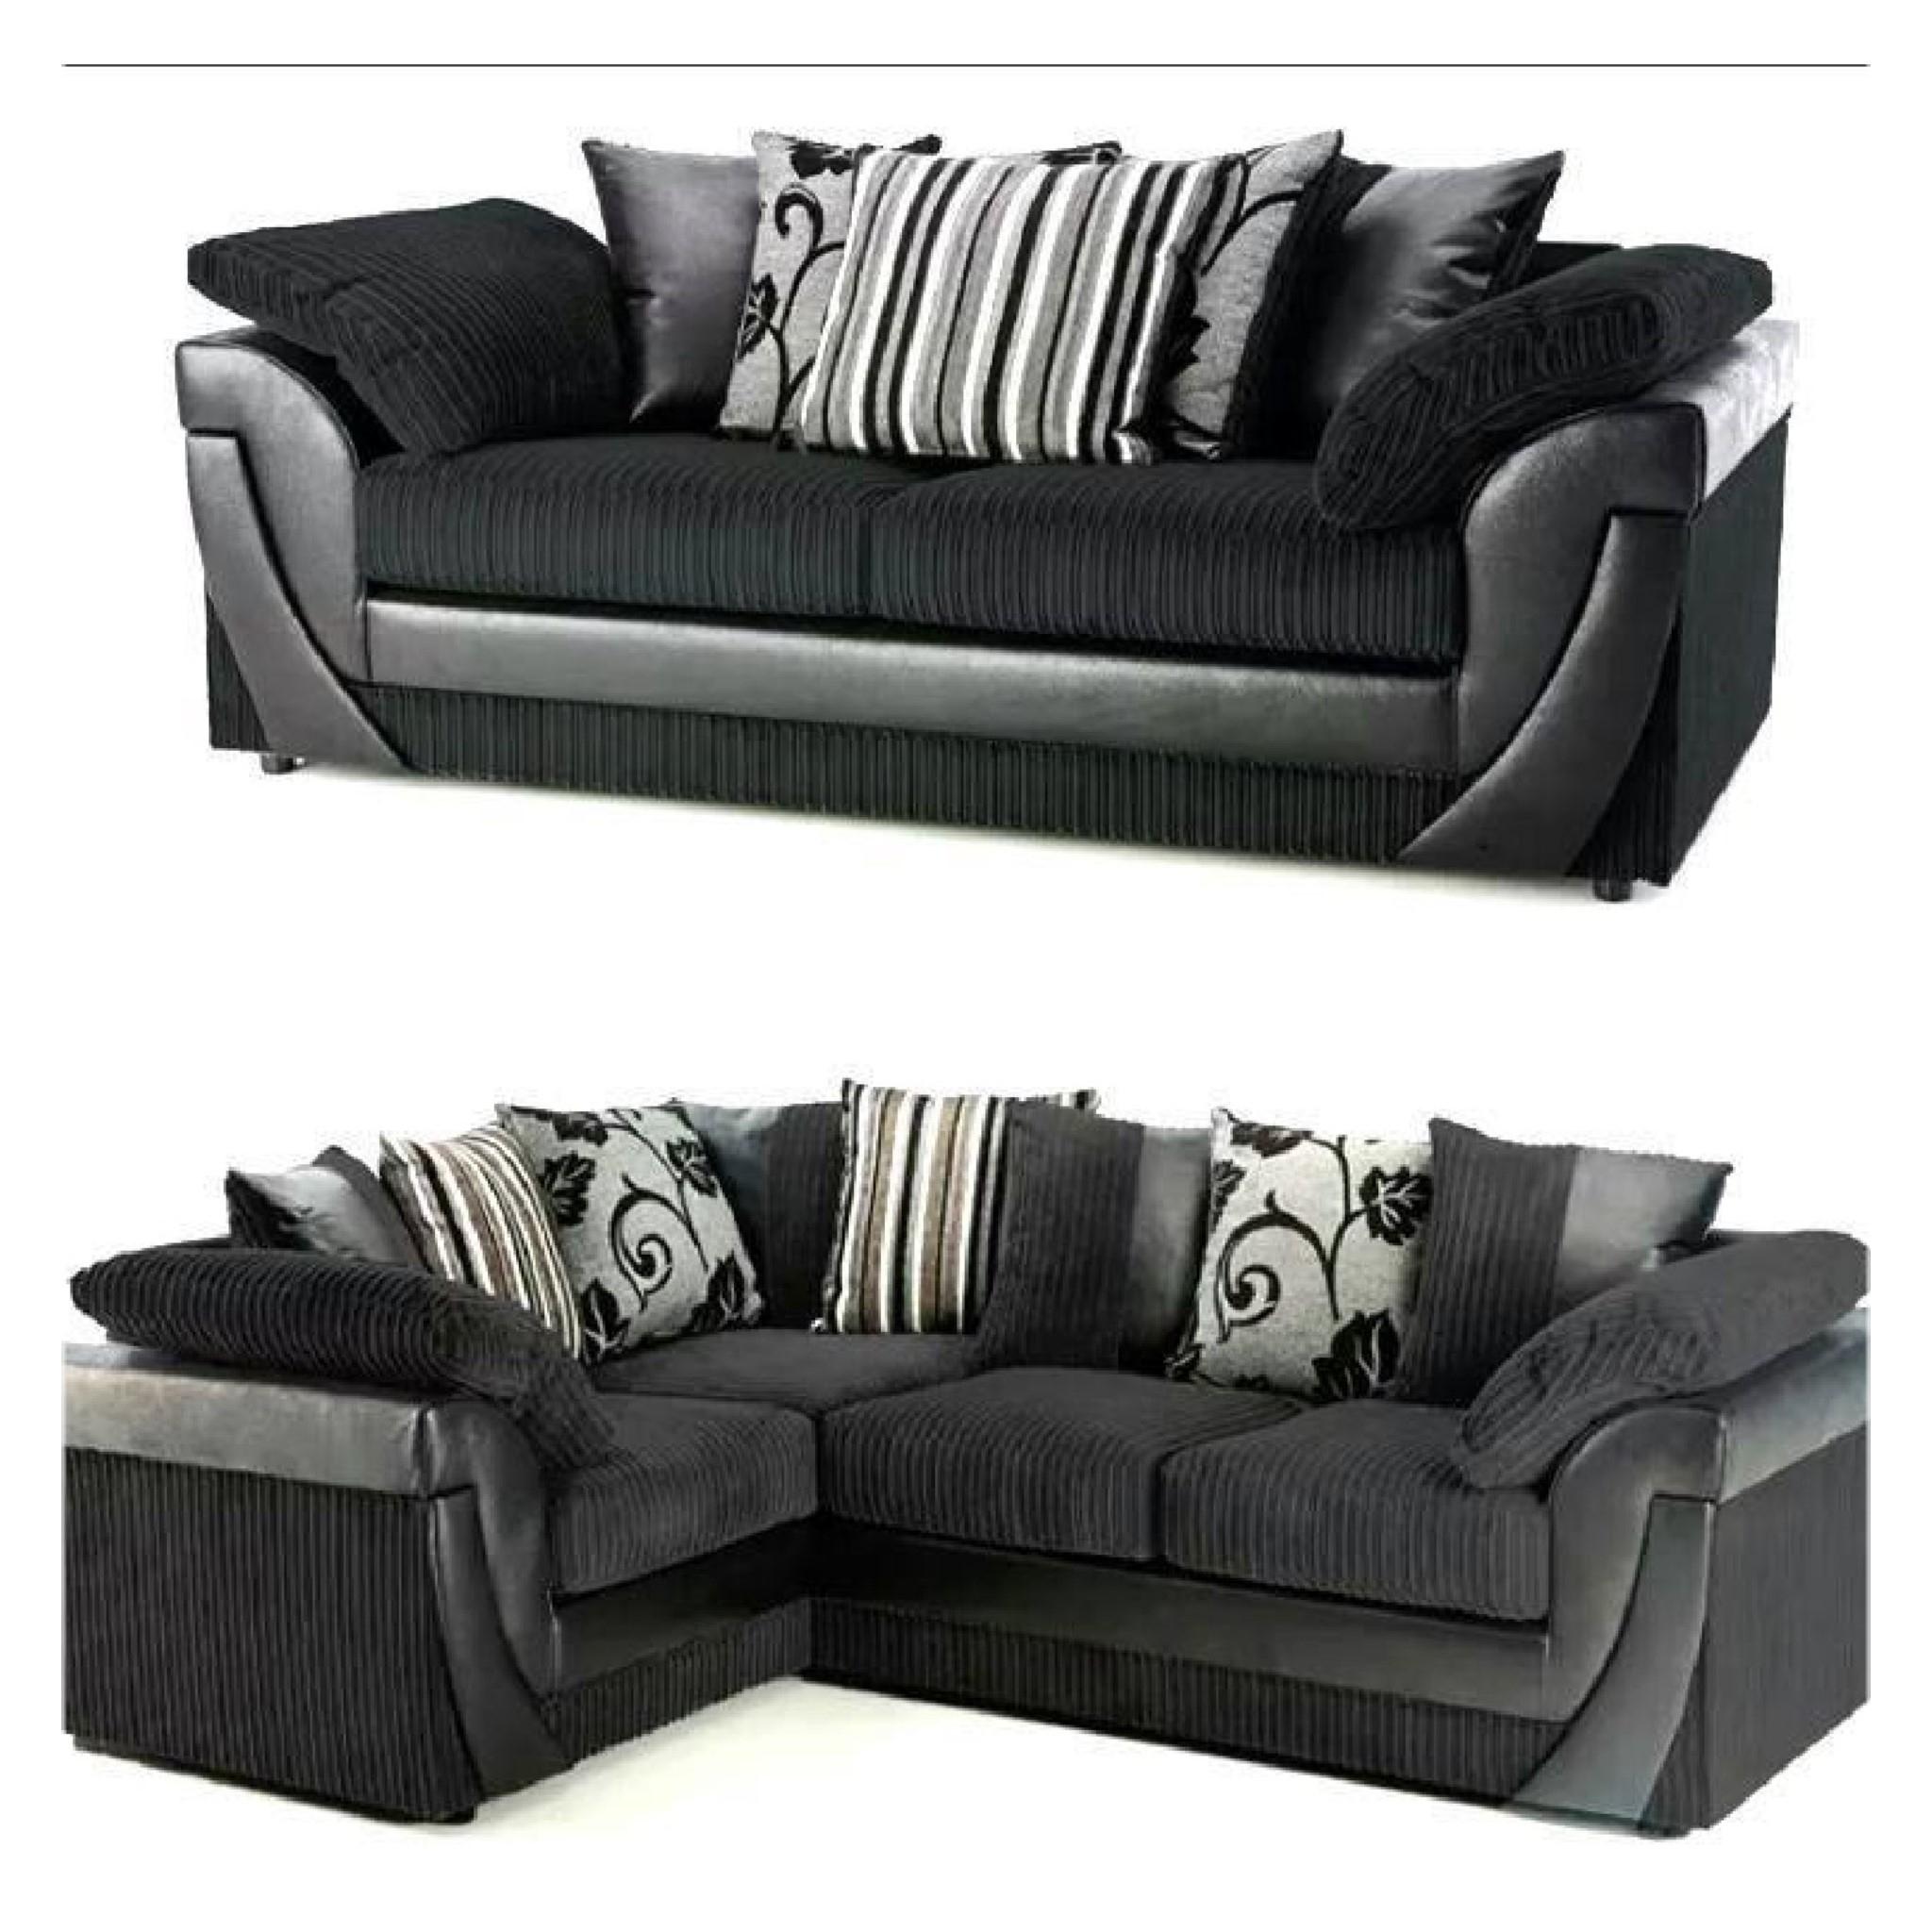 Fabric Corner Sofas With Trendy Lush Fabric Corner Sofa Set – Sofa Factory Uk (Gallery 20 of 20)